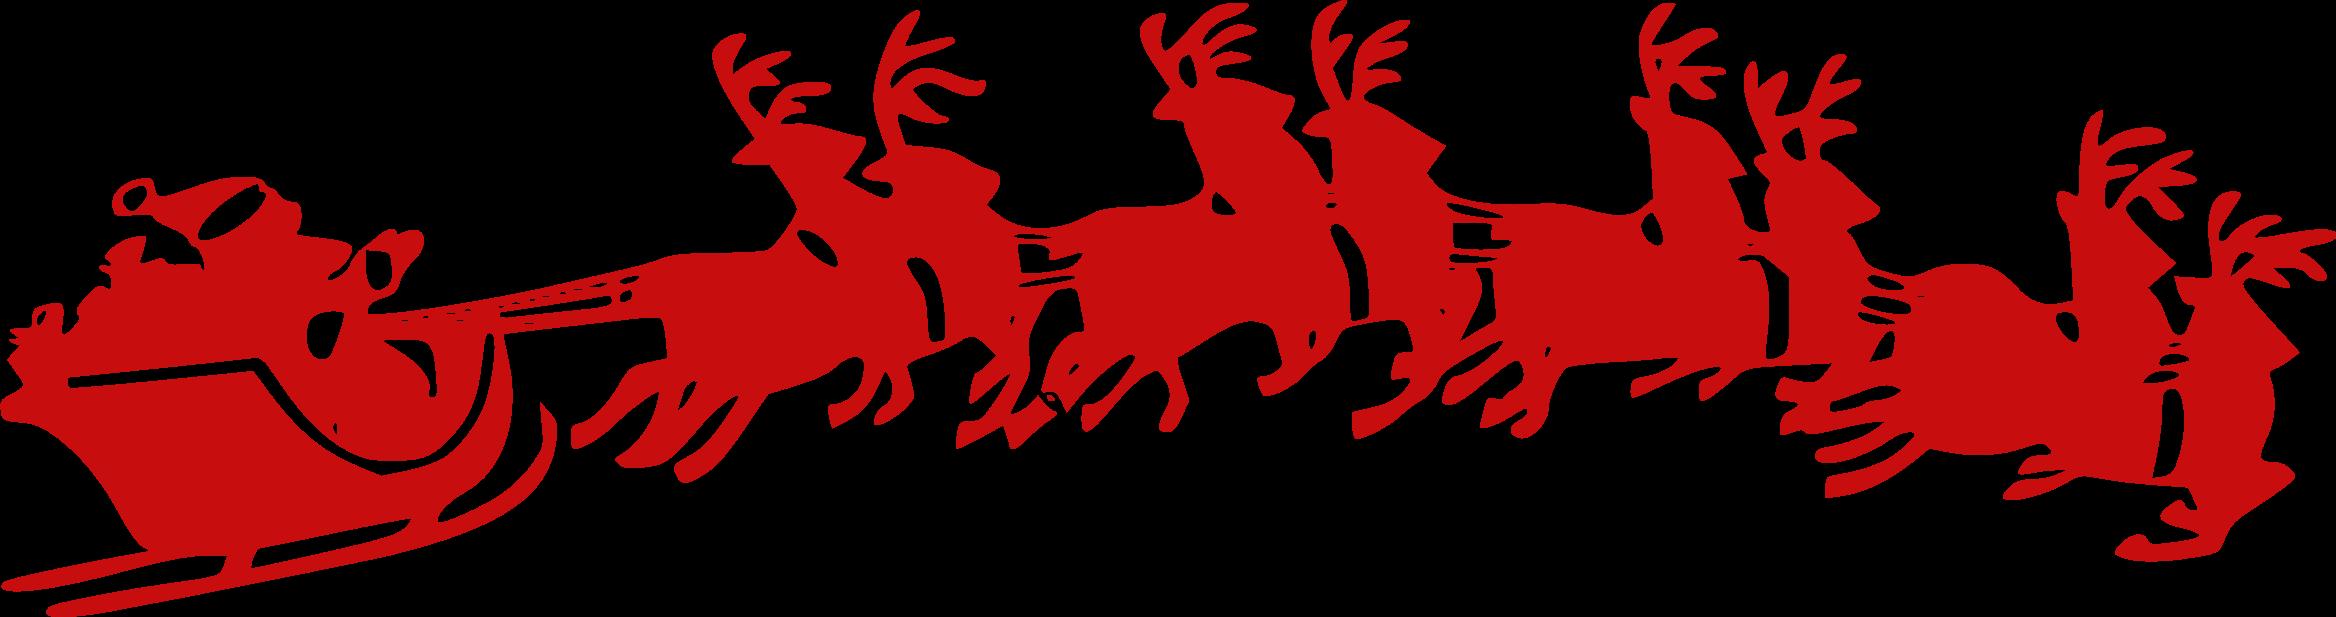 Santa Sleigh PNG Pictures, Santa Sleigh Clipart Free.